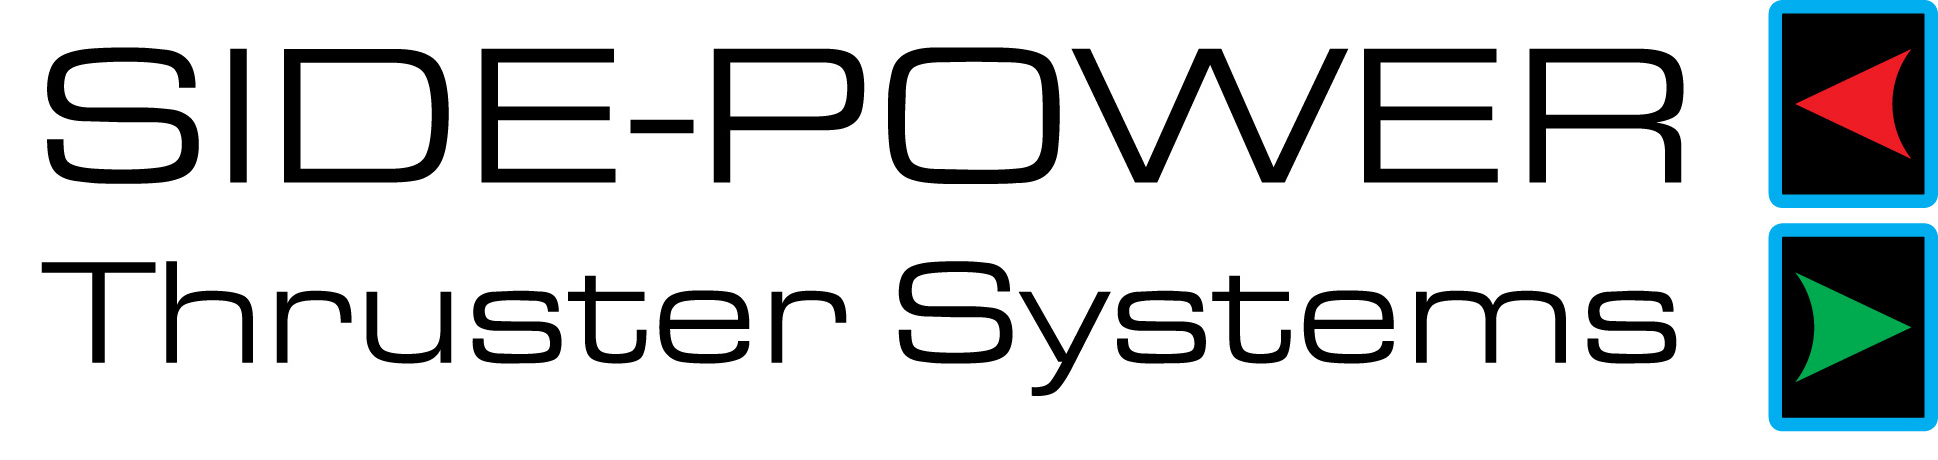 Side-Power Logo